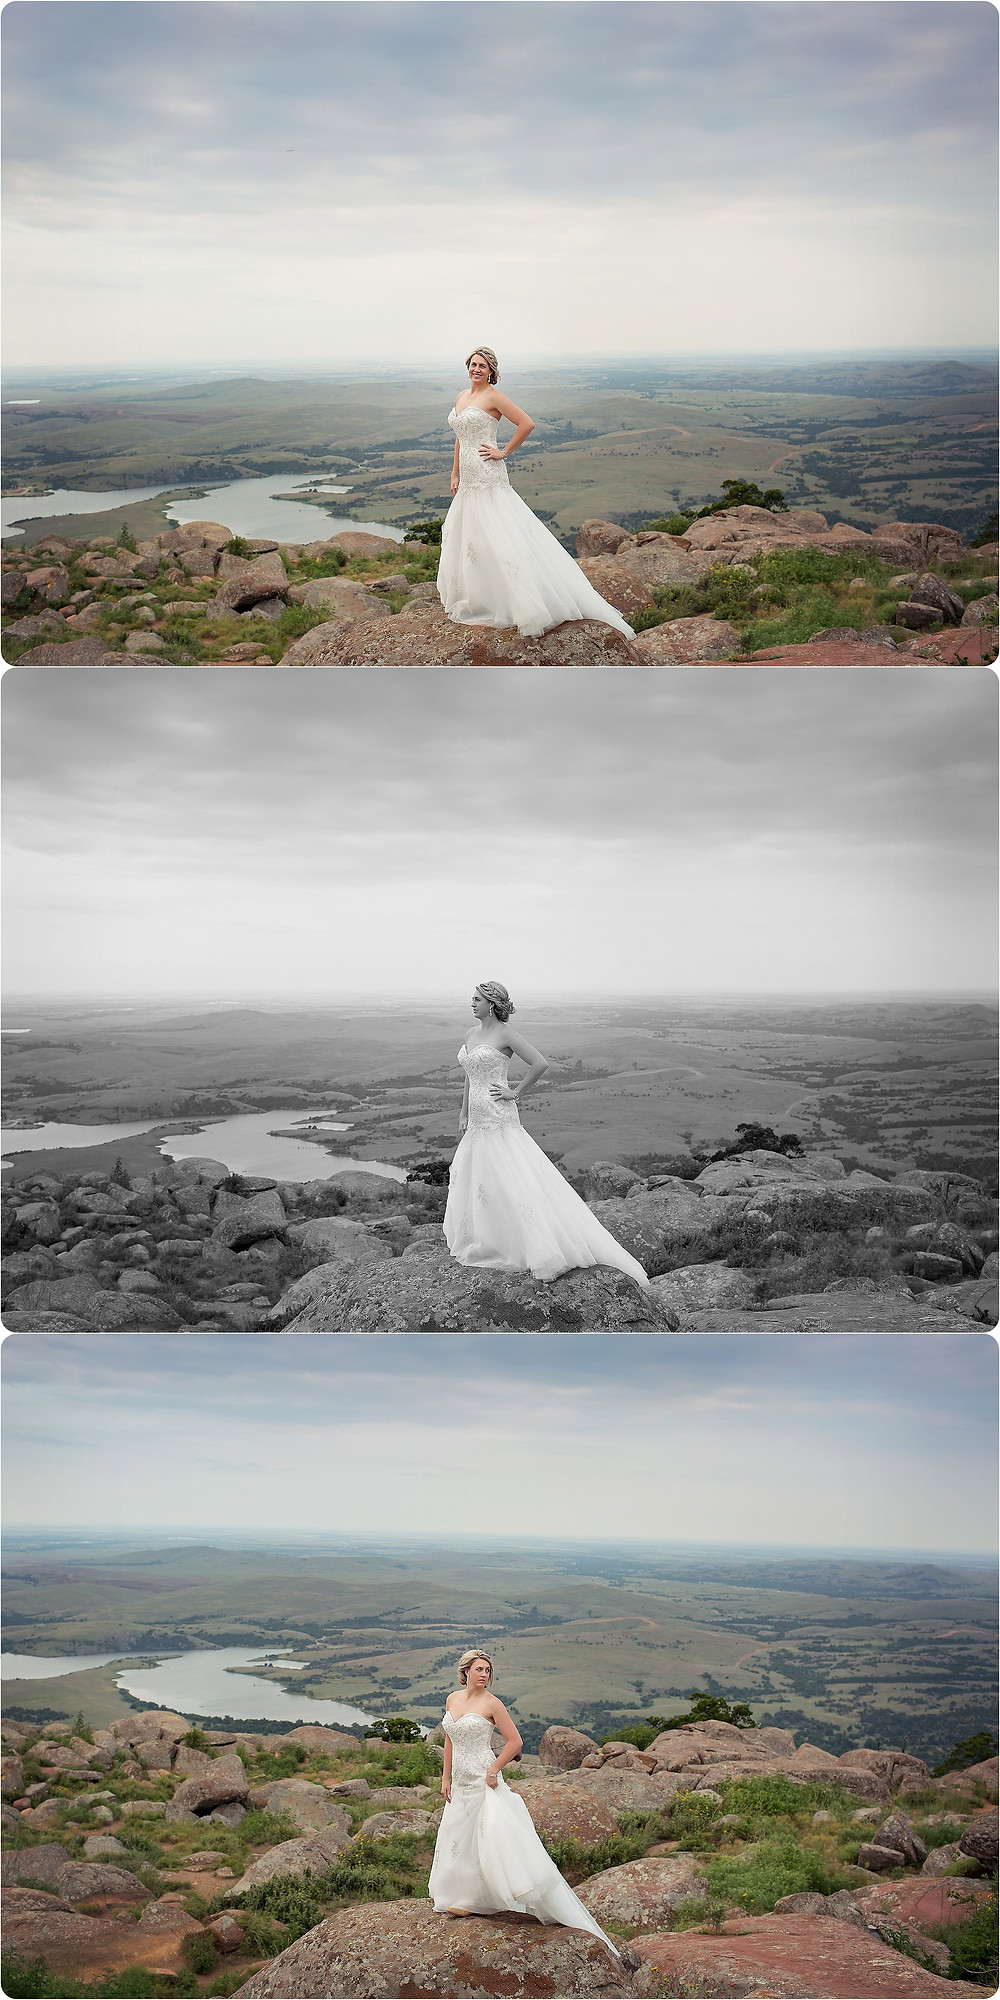 Mt. Scott Bridal Photographer